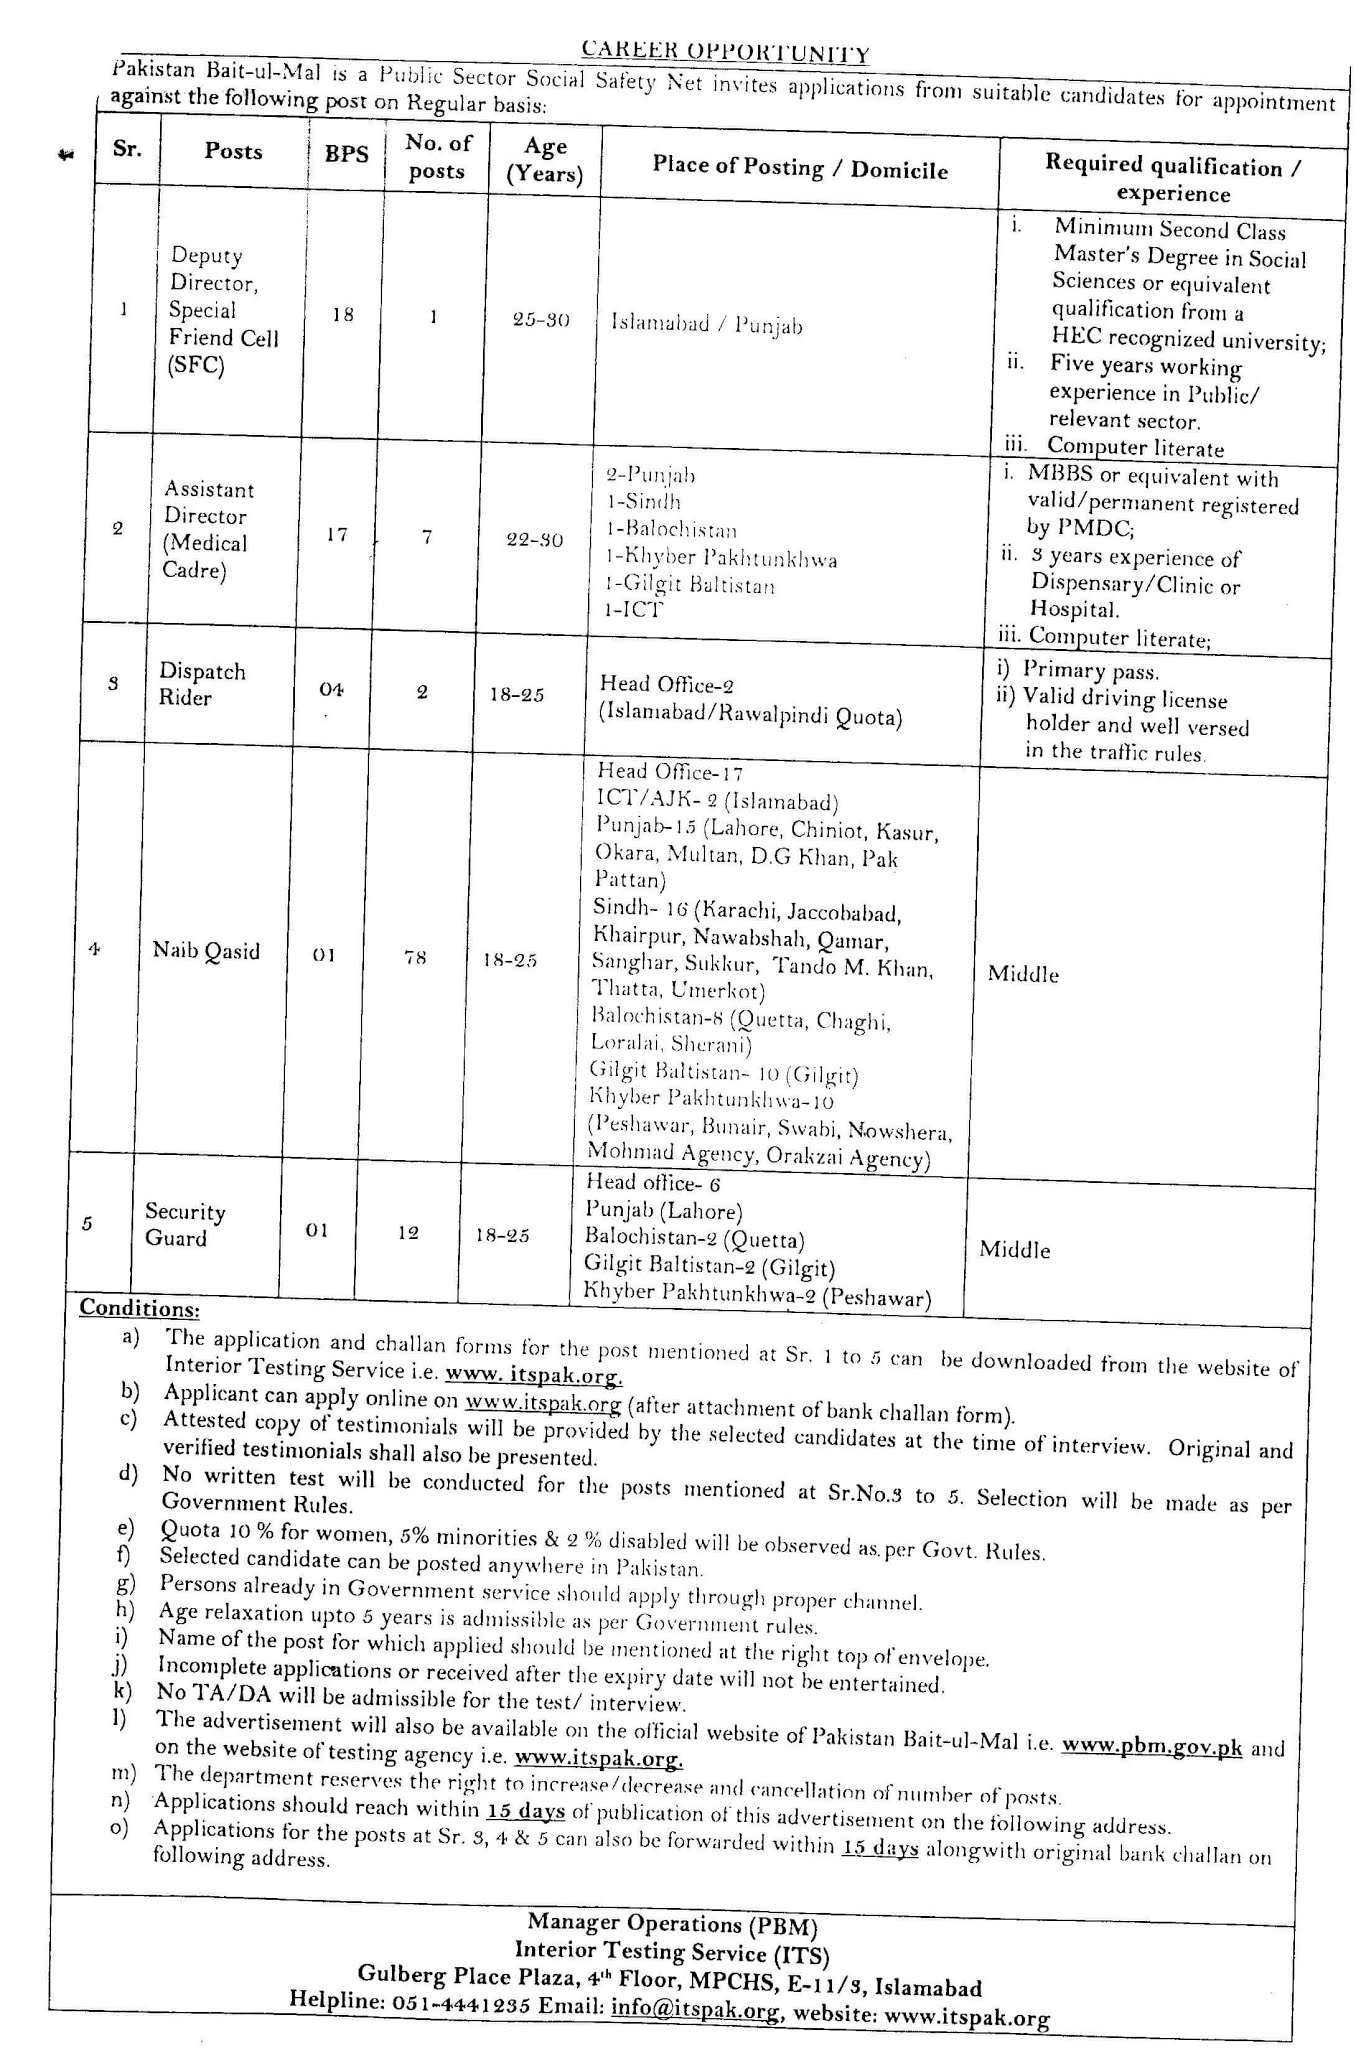 Baitulmal Jobs 2020 - www.pbm.gov.pk jobs 2020